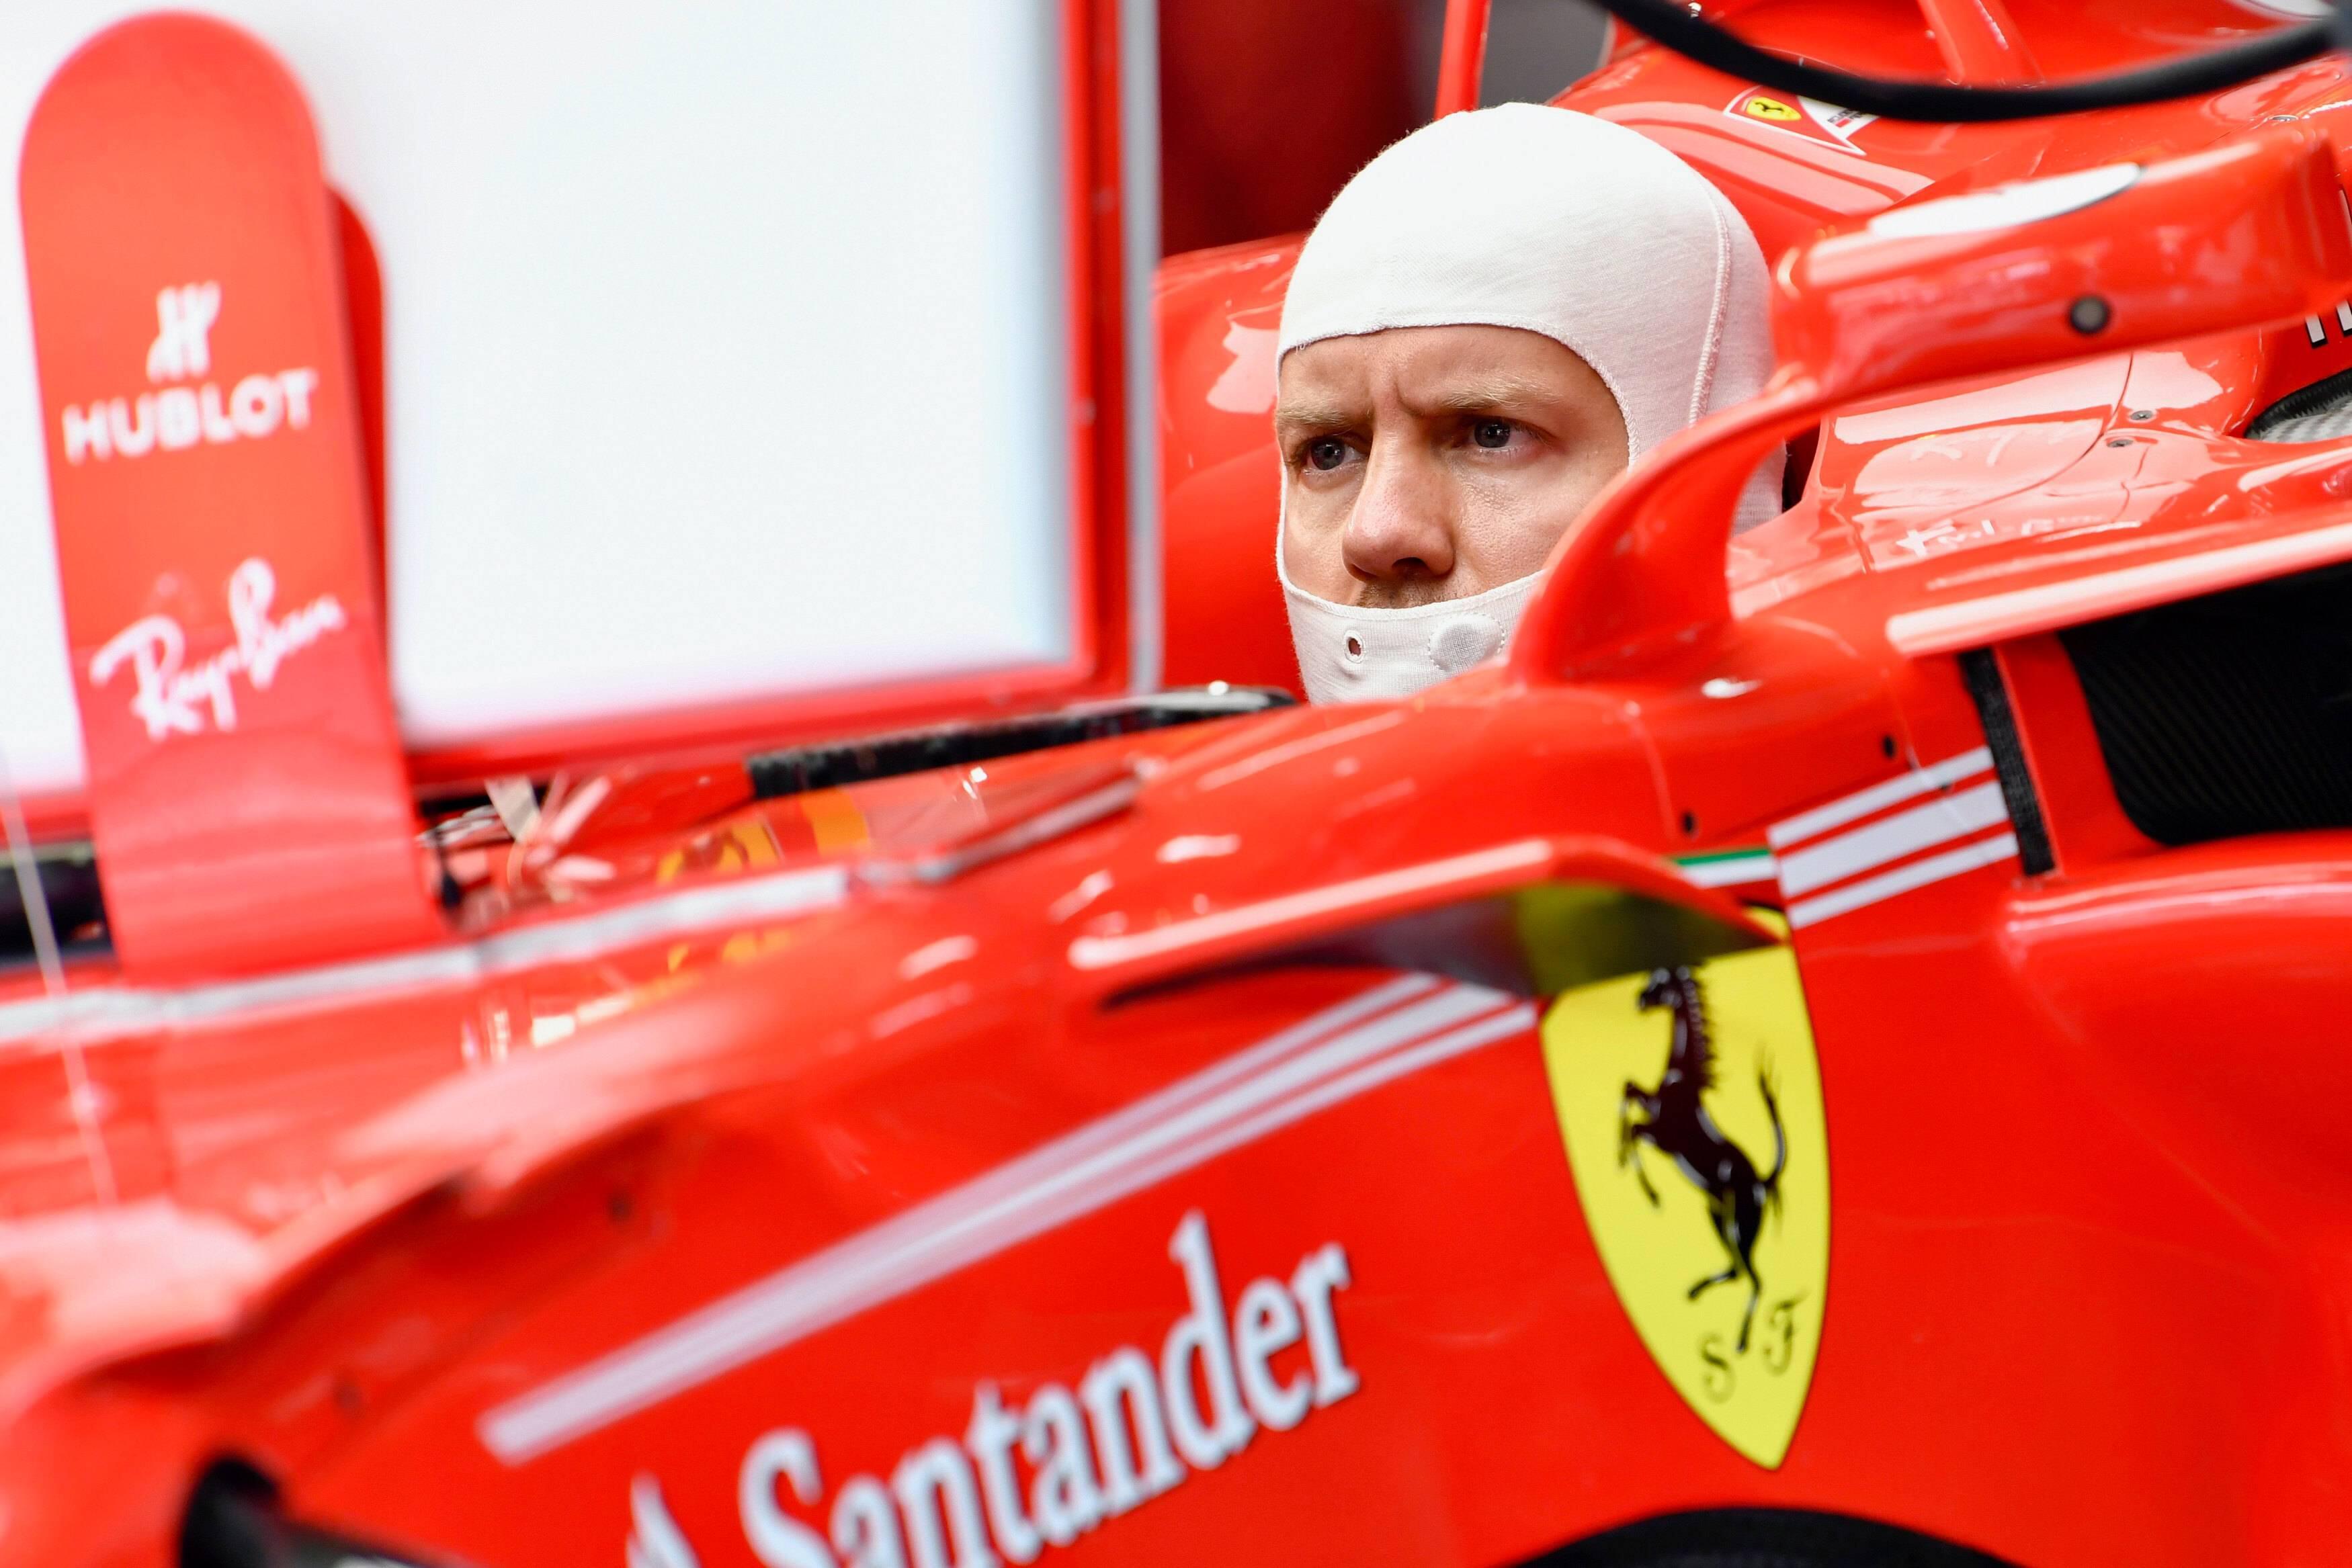 Bild zu Sebastian Vettel, Formel 1, Weltmeisterschaft, Lewis Hamilton